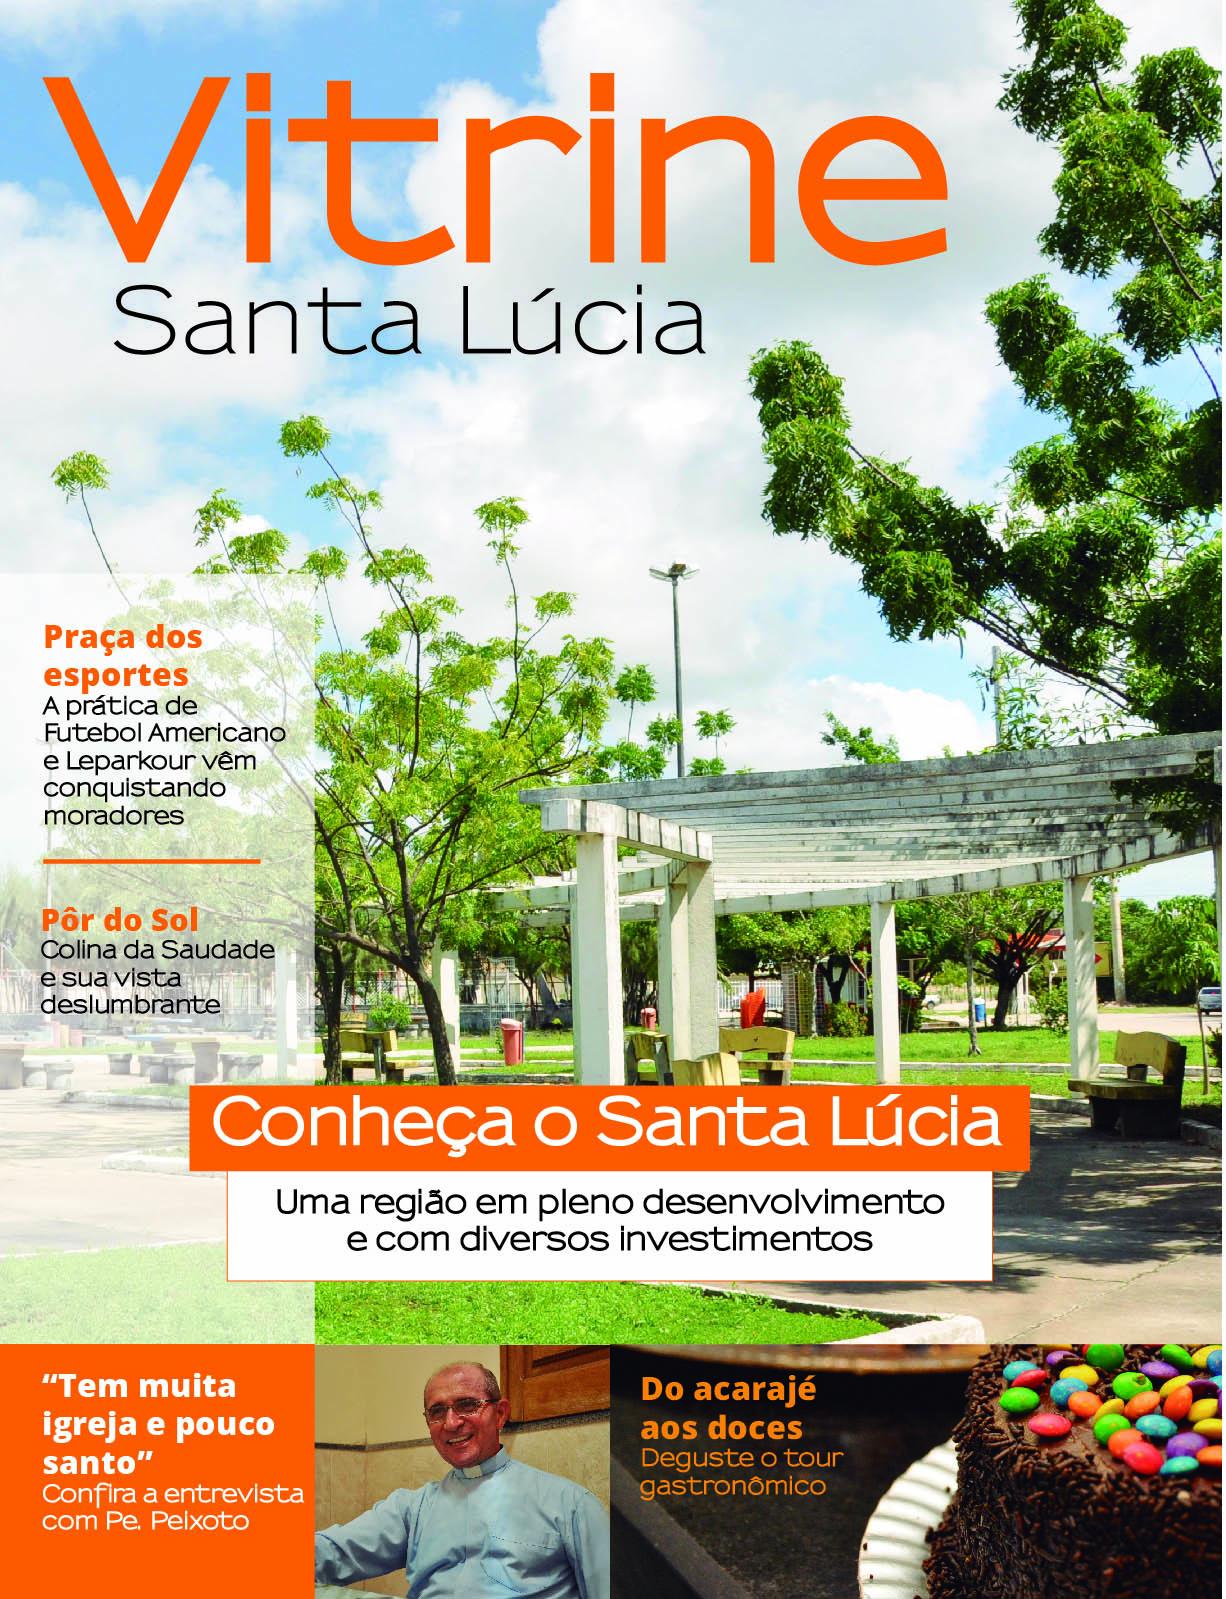 CAPA VITRINE SANTA LÚCIA DEFINITIVA.jpg